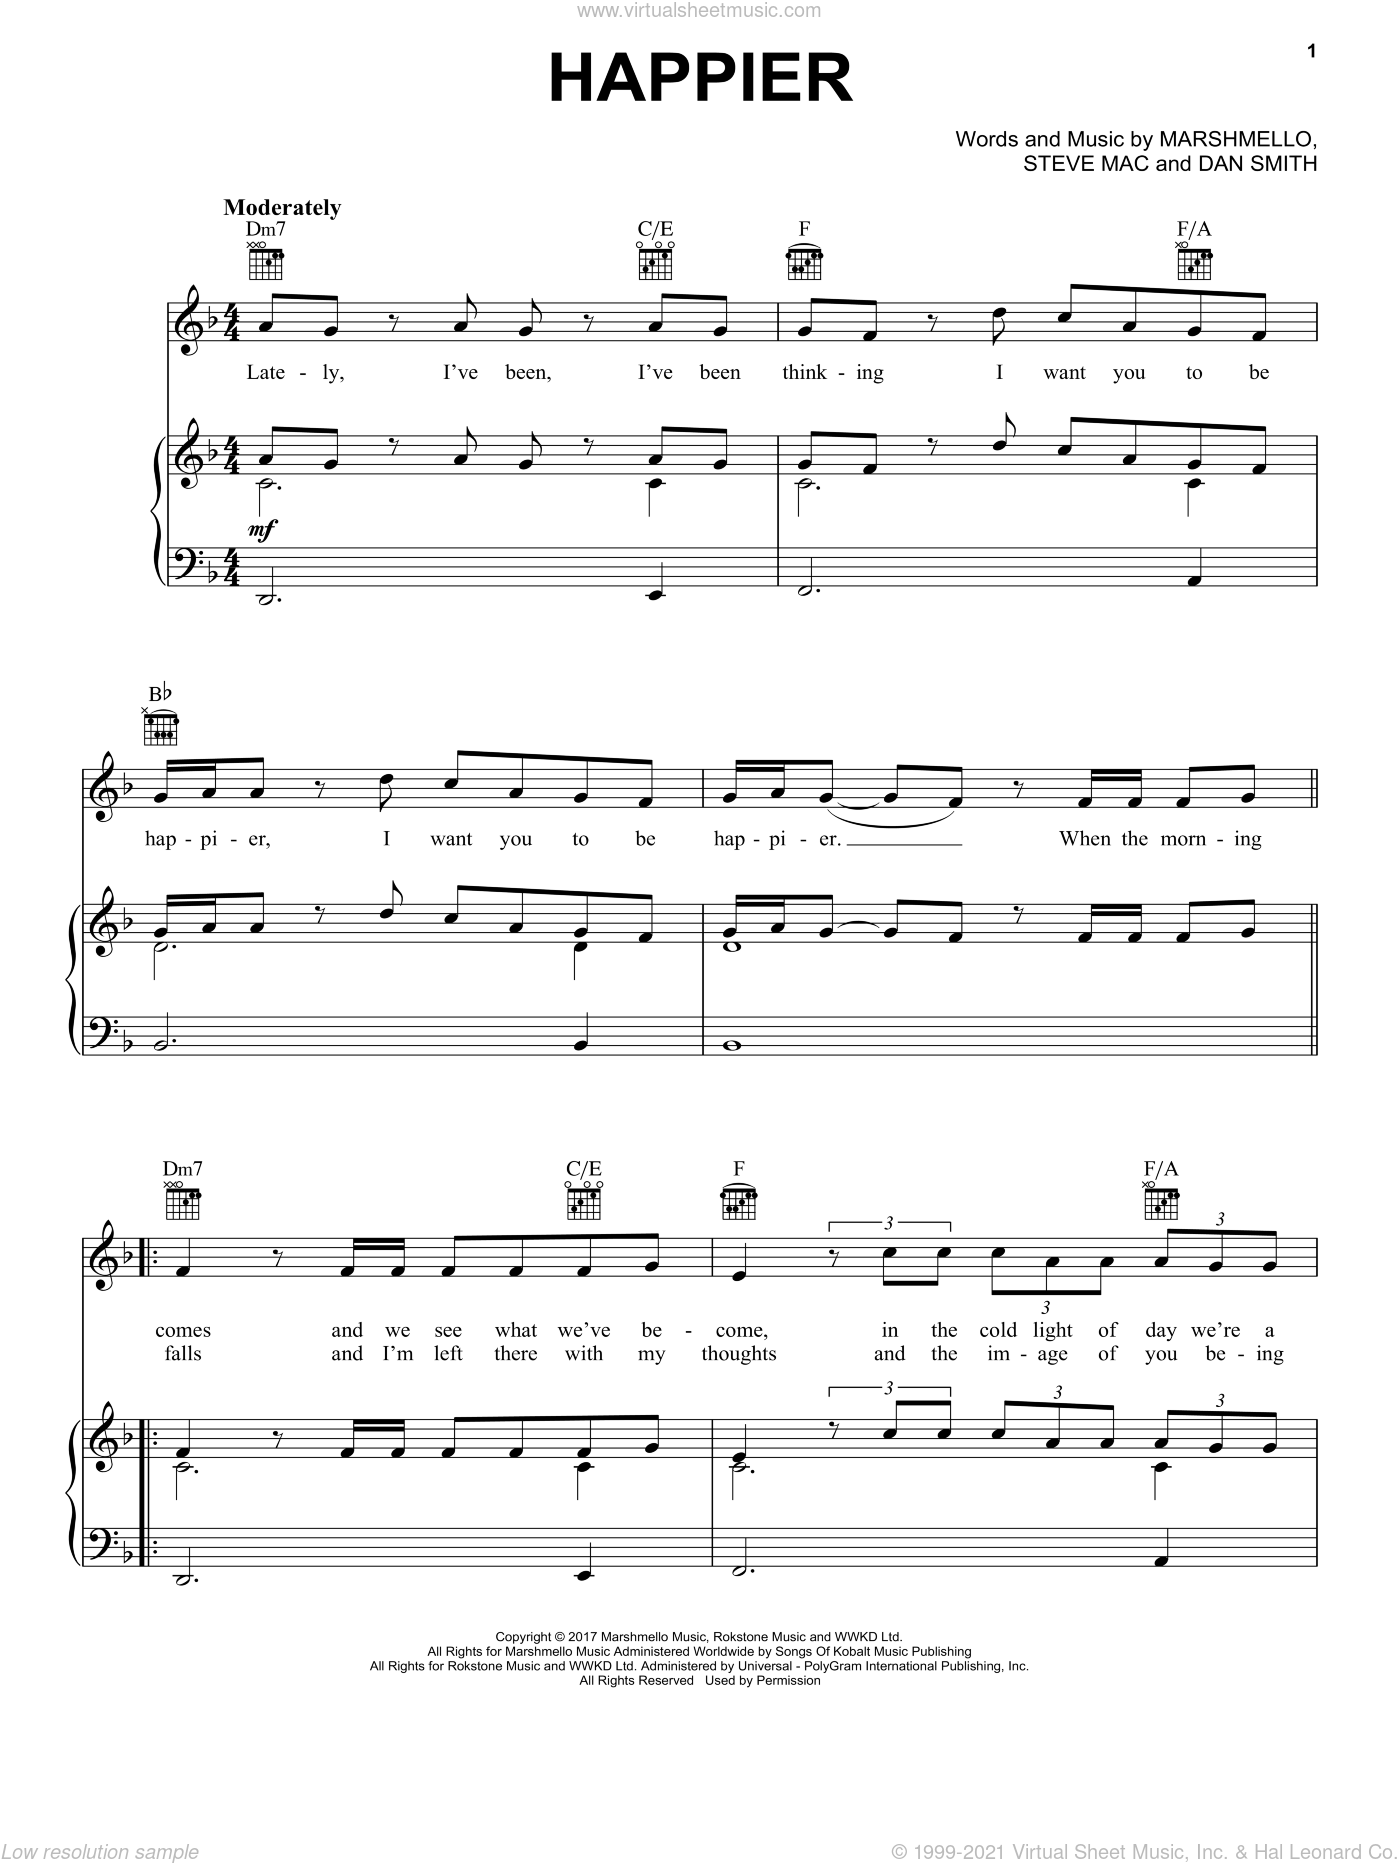 Happier sheet music for voice, piano or guitar by Marshmello, Marshmello & Bastille, Dan Smith and Steve Mac, intermediate skill level